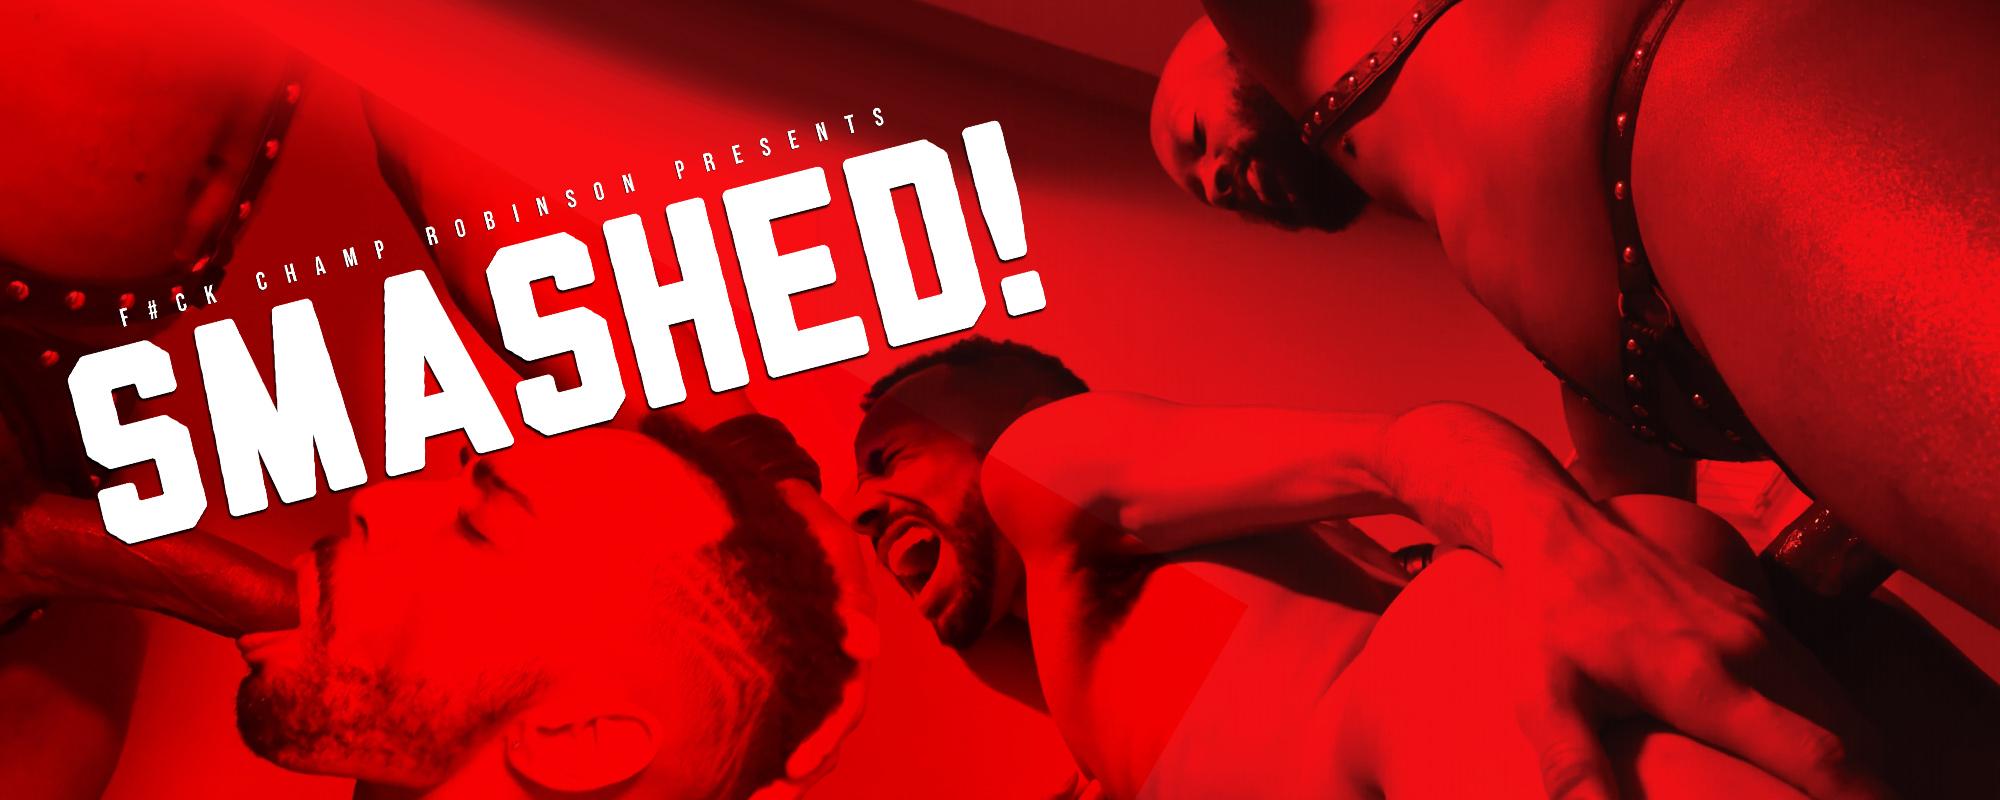 Fuck Champ Robinson: Smashed!